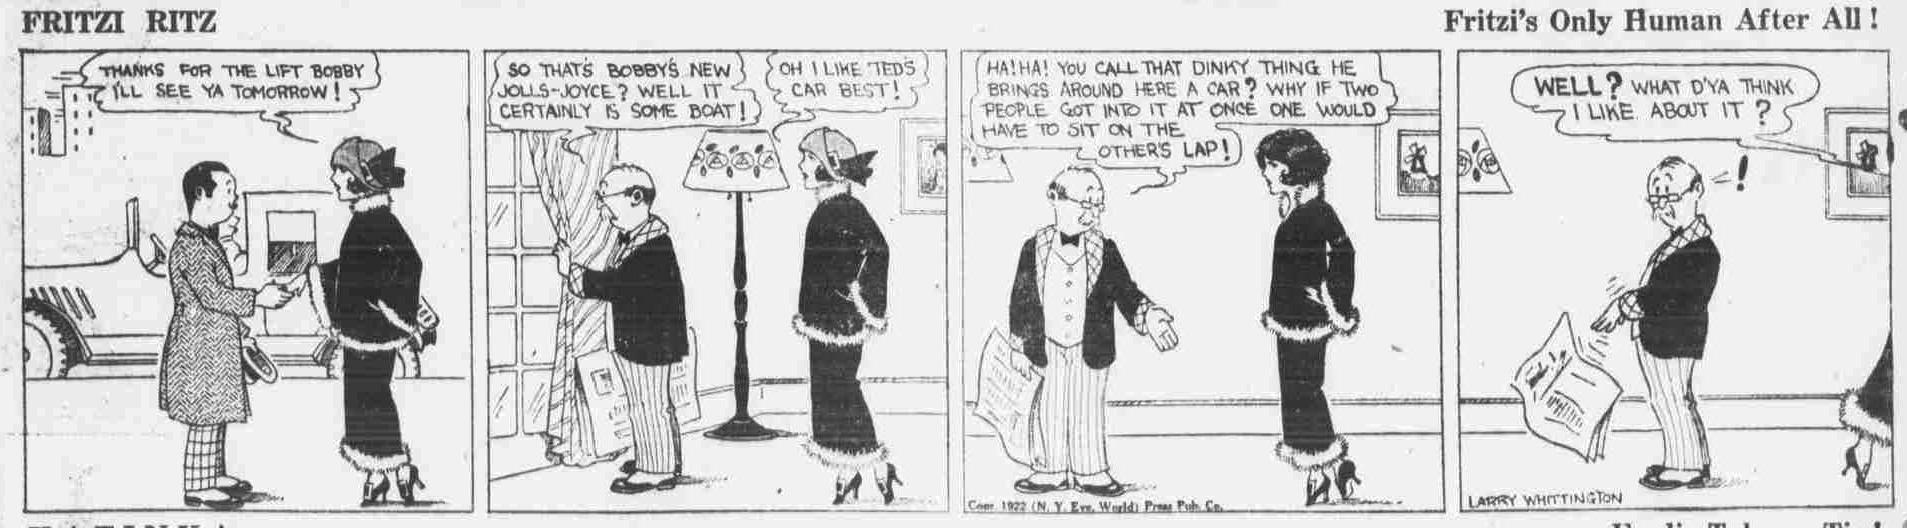 Dec. 15, 1922